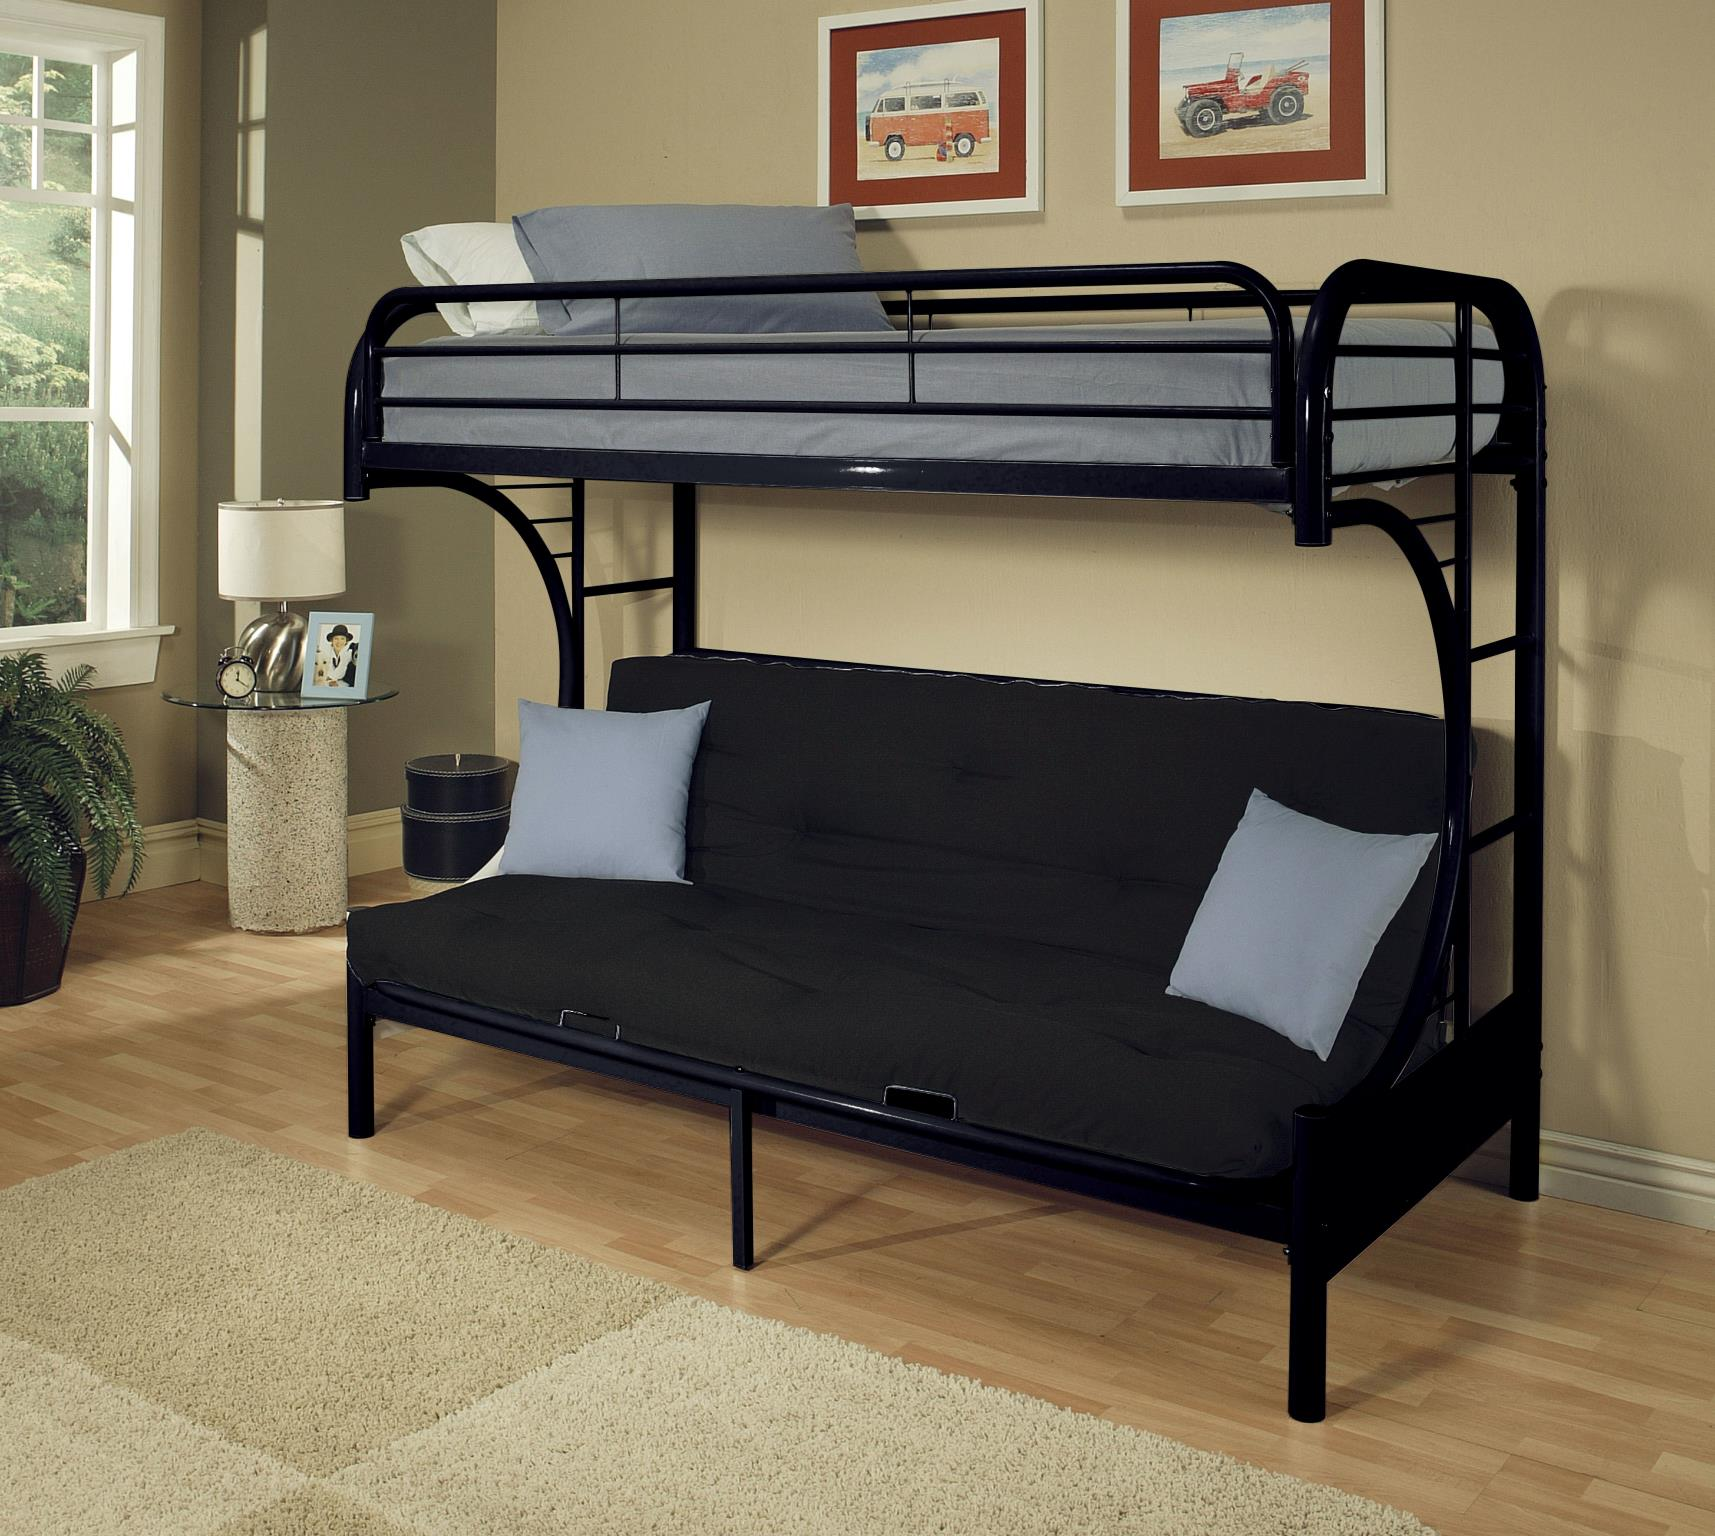 Black Twin XL/Queen Futon Bunk Bed